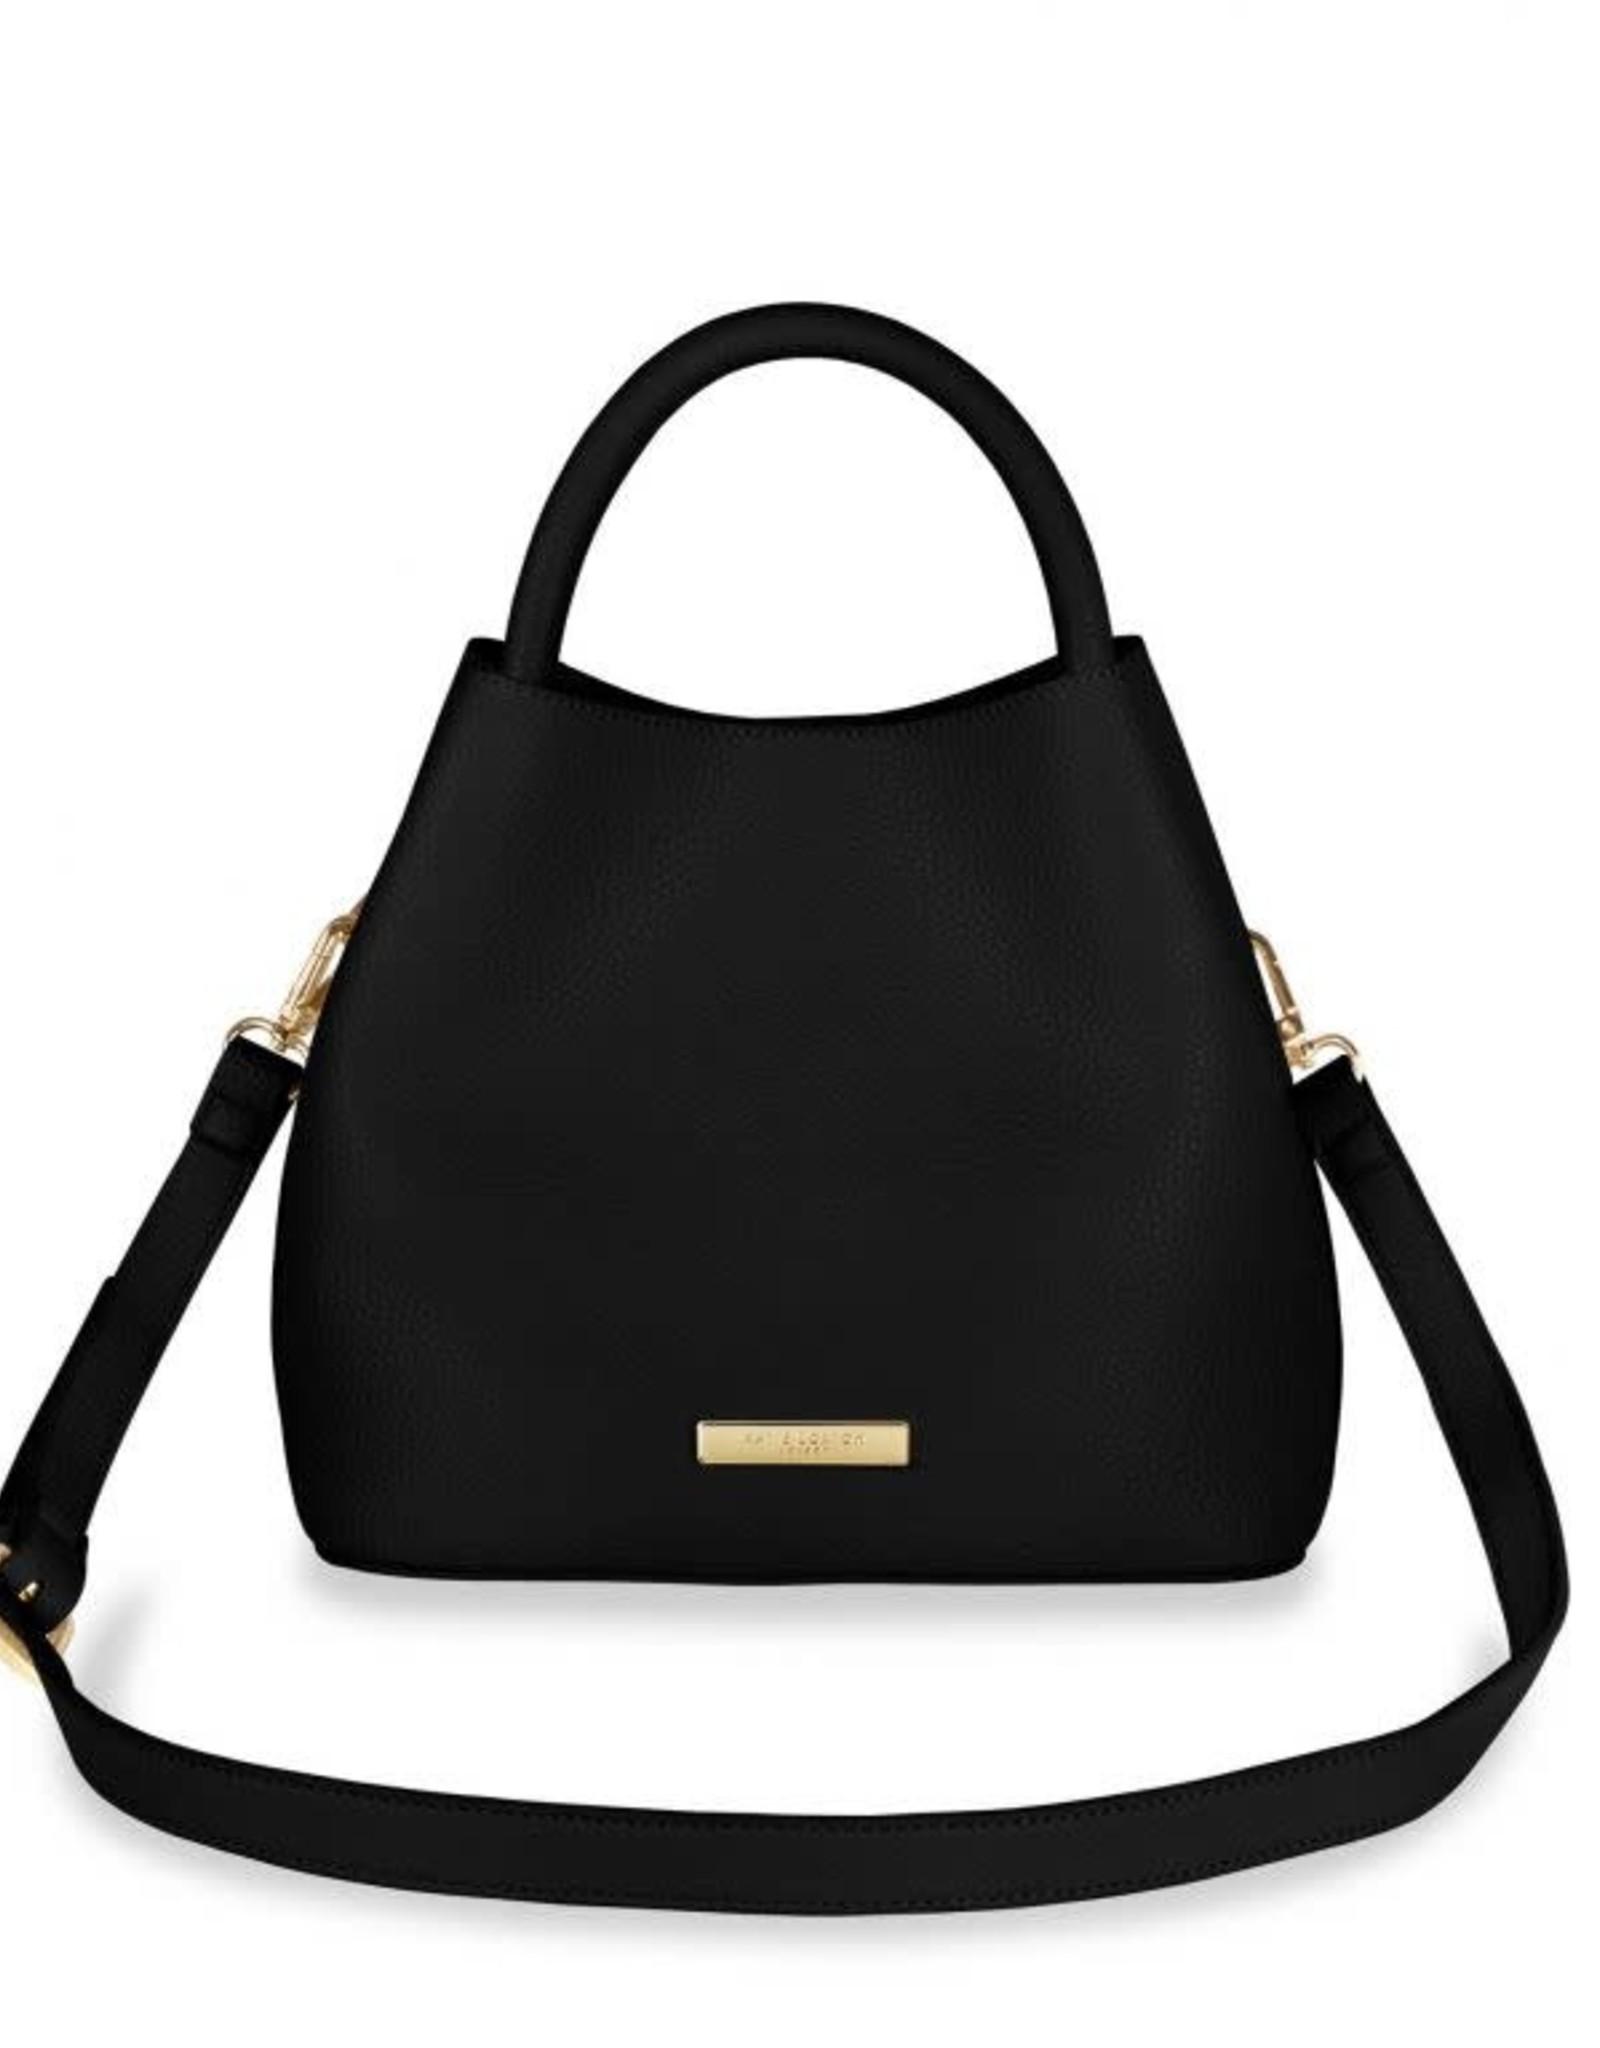 Katie Loxton Sienna Slouch Bag - Black